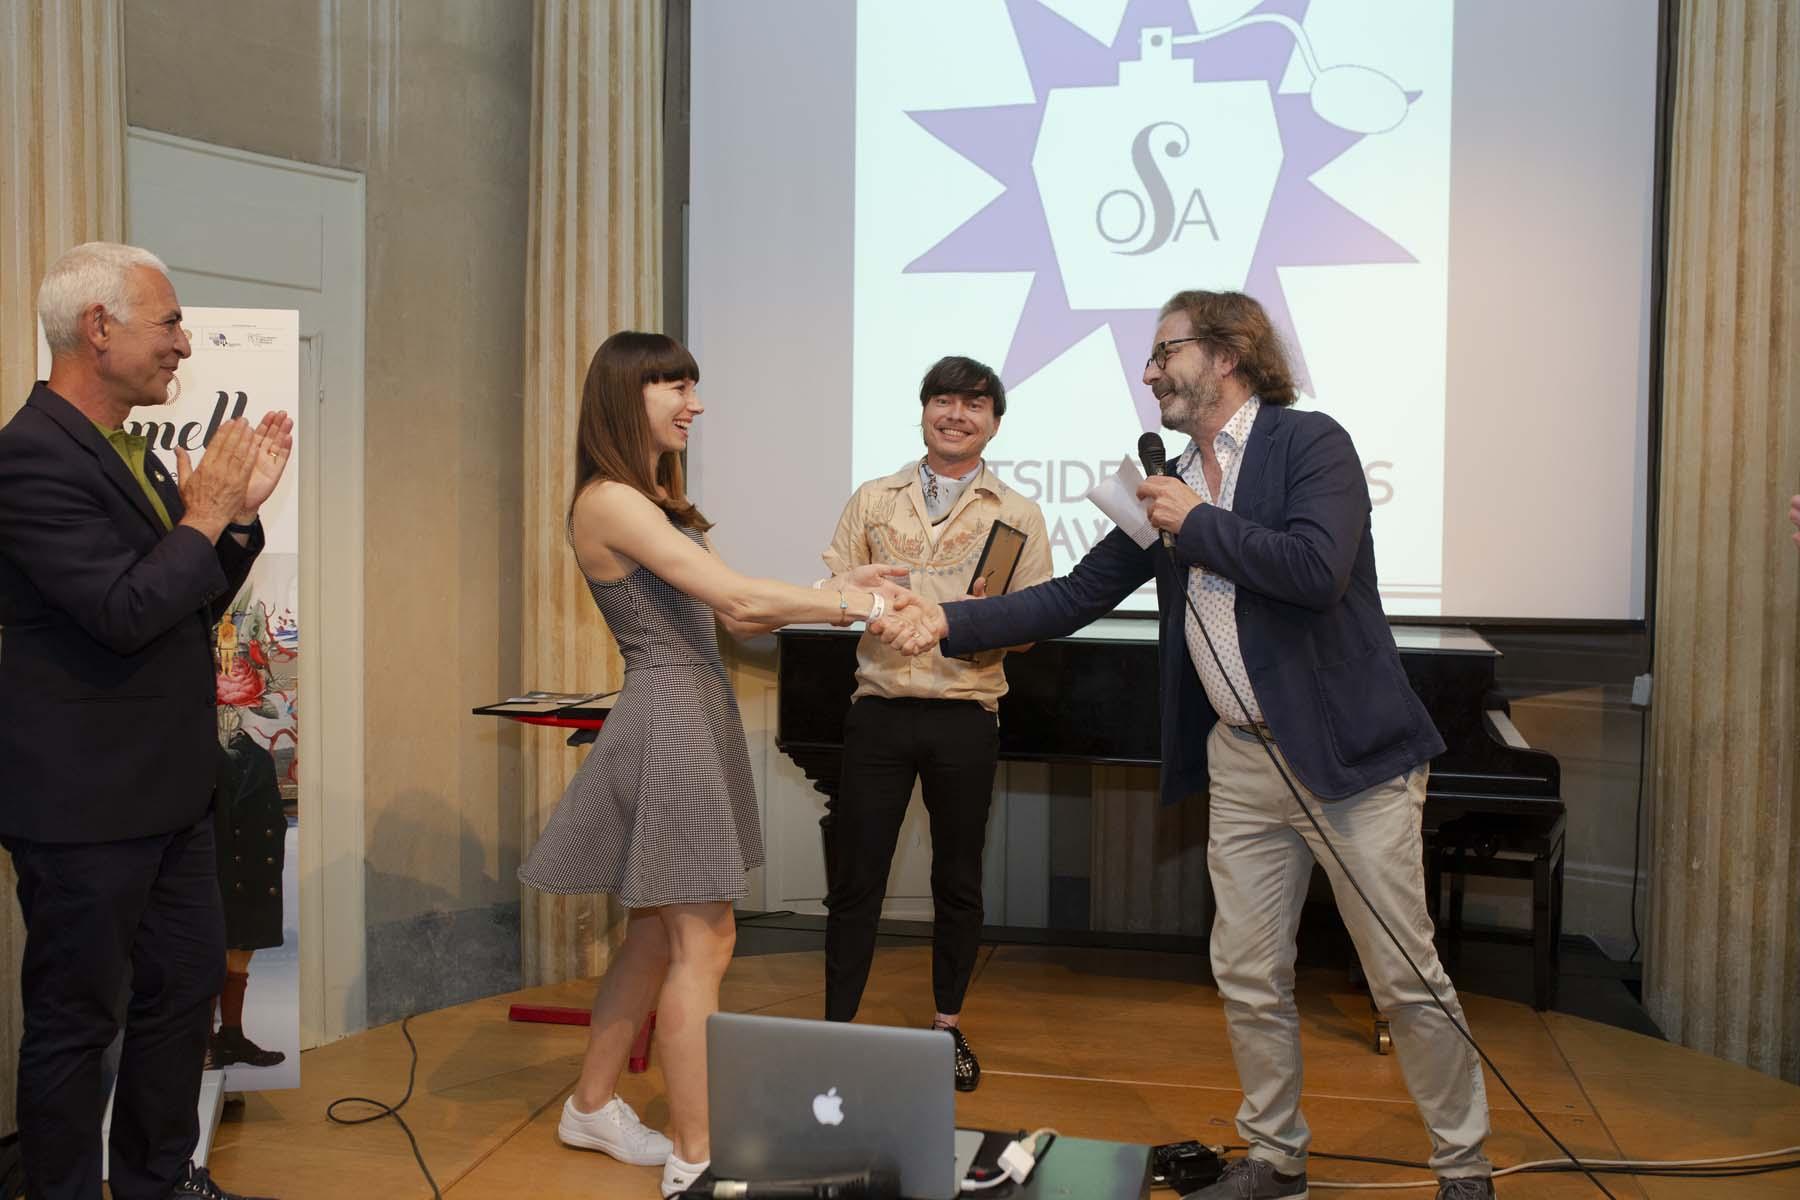 Marta Mason OSA! Award 2018